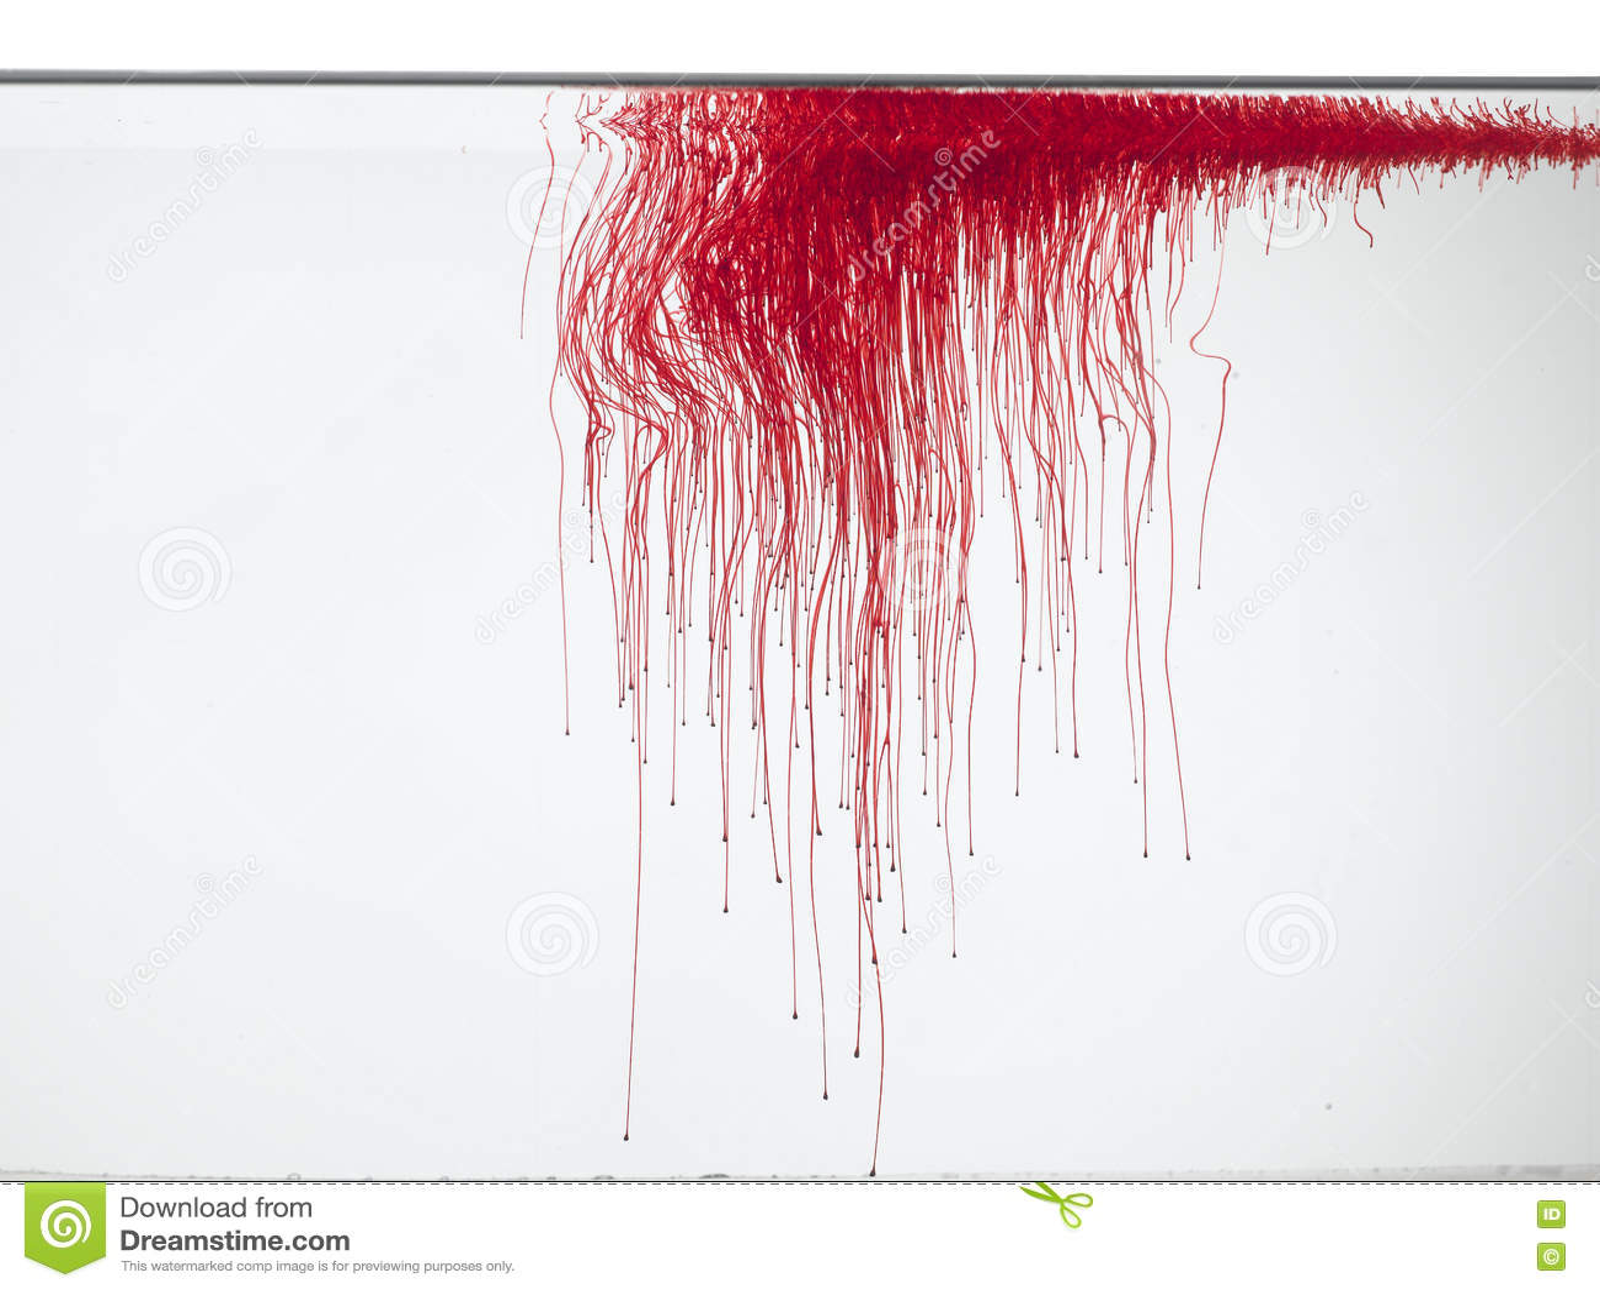 Rote Farbe Im Wasser Stockbild Bild Von Lack Pour Mord 71950097